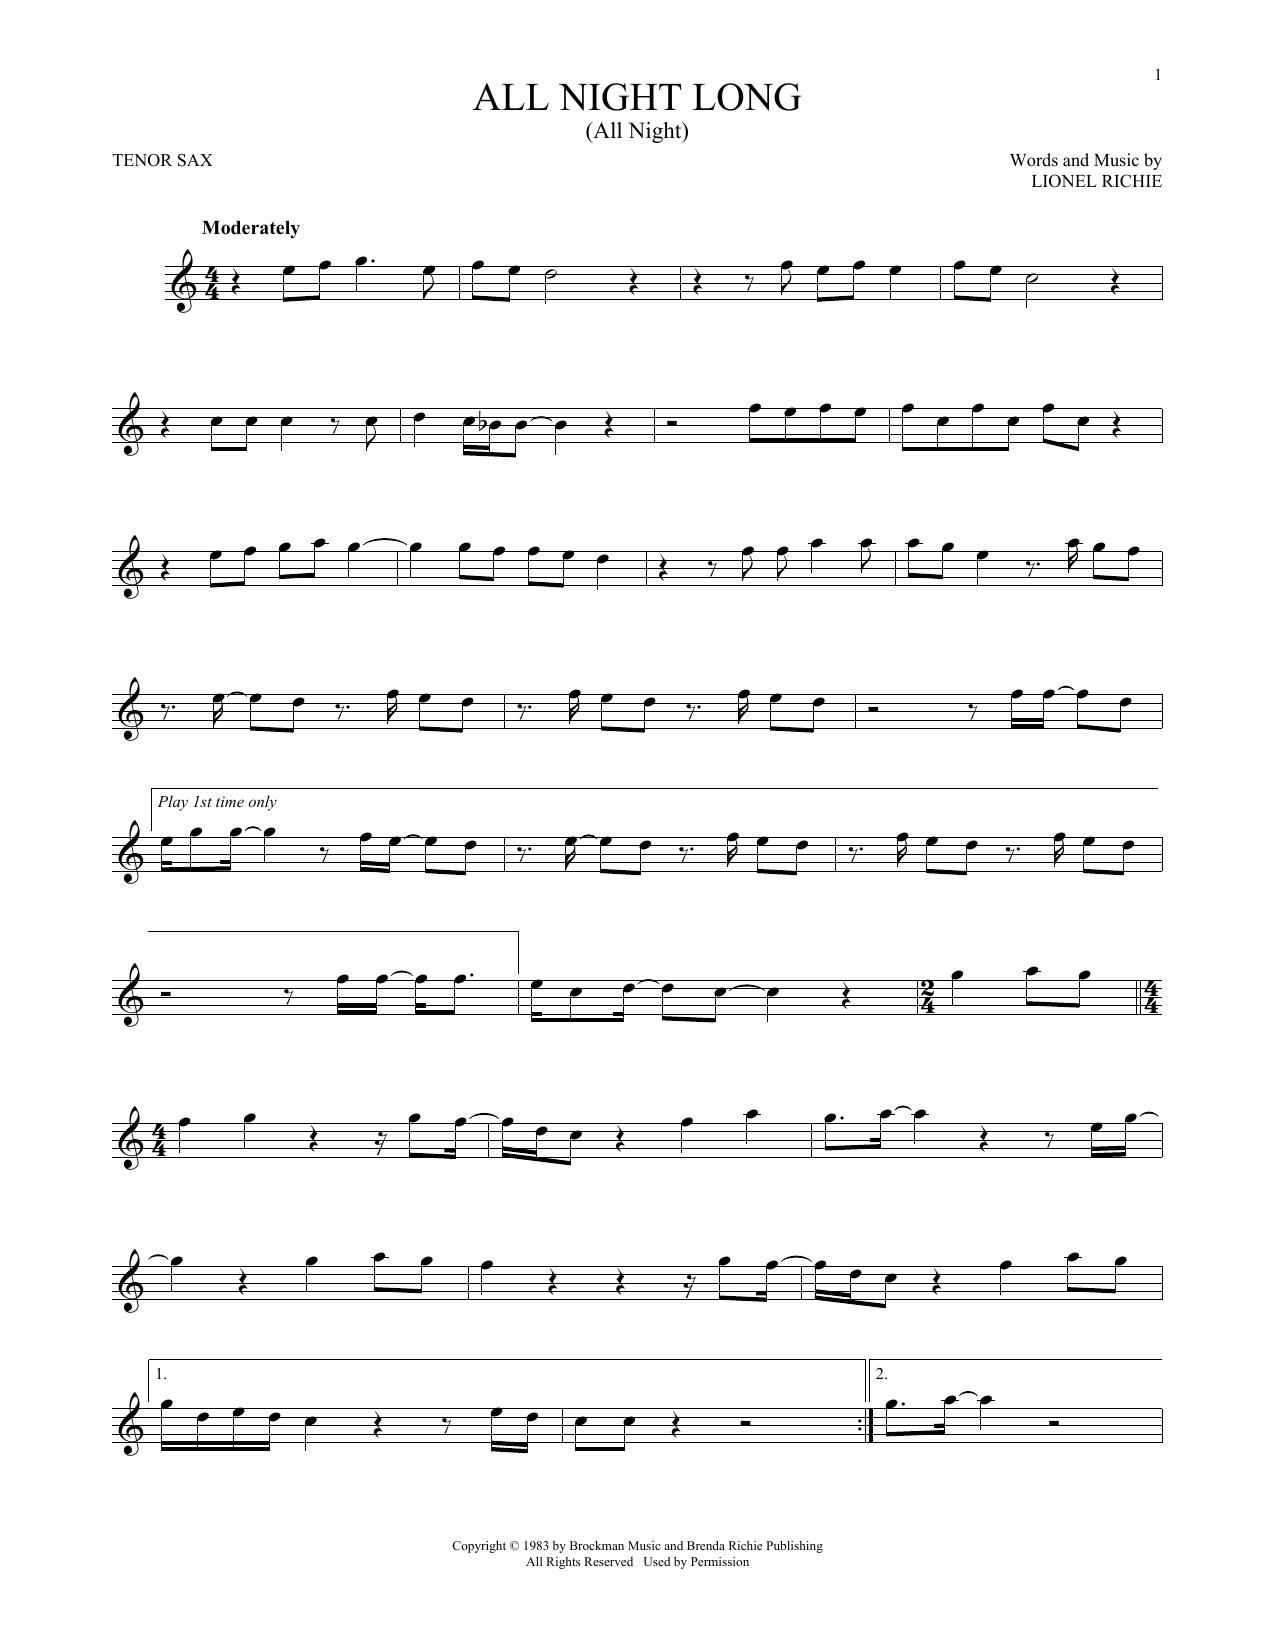 All Night Long (All Night) (Tenor Sax Solo)